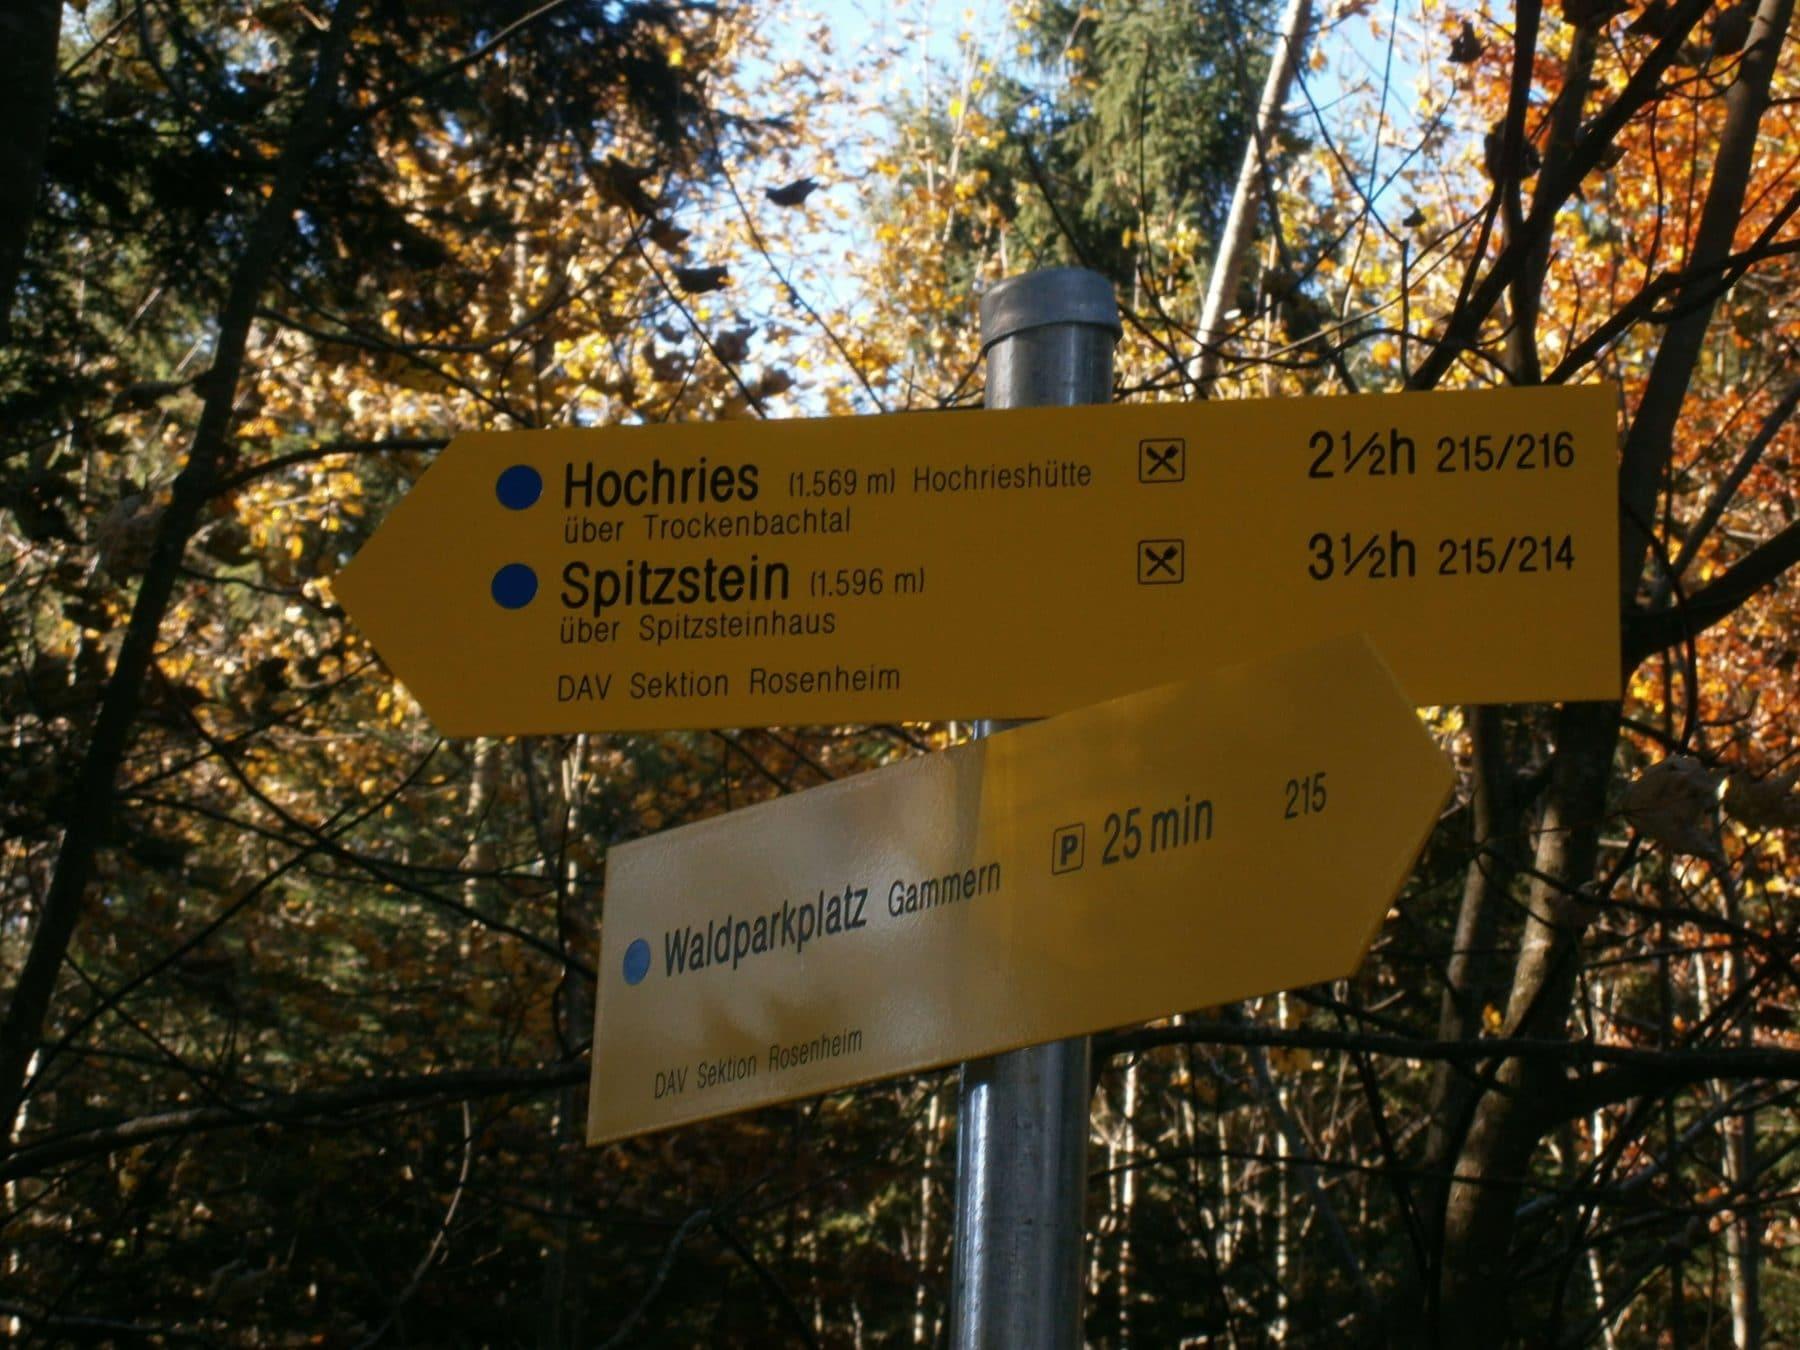 samerberg-schwarzrieshuette-9-schilder-abkuerzung-links